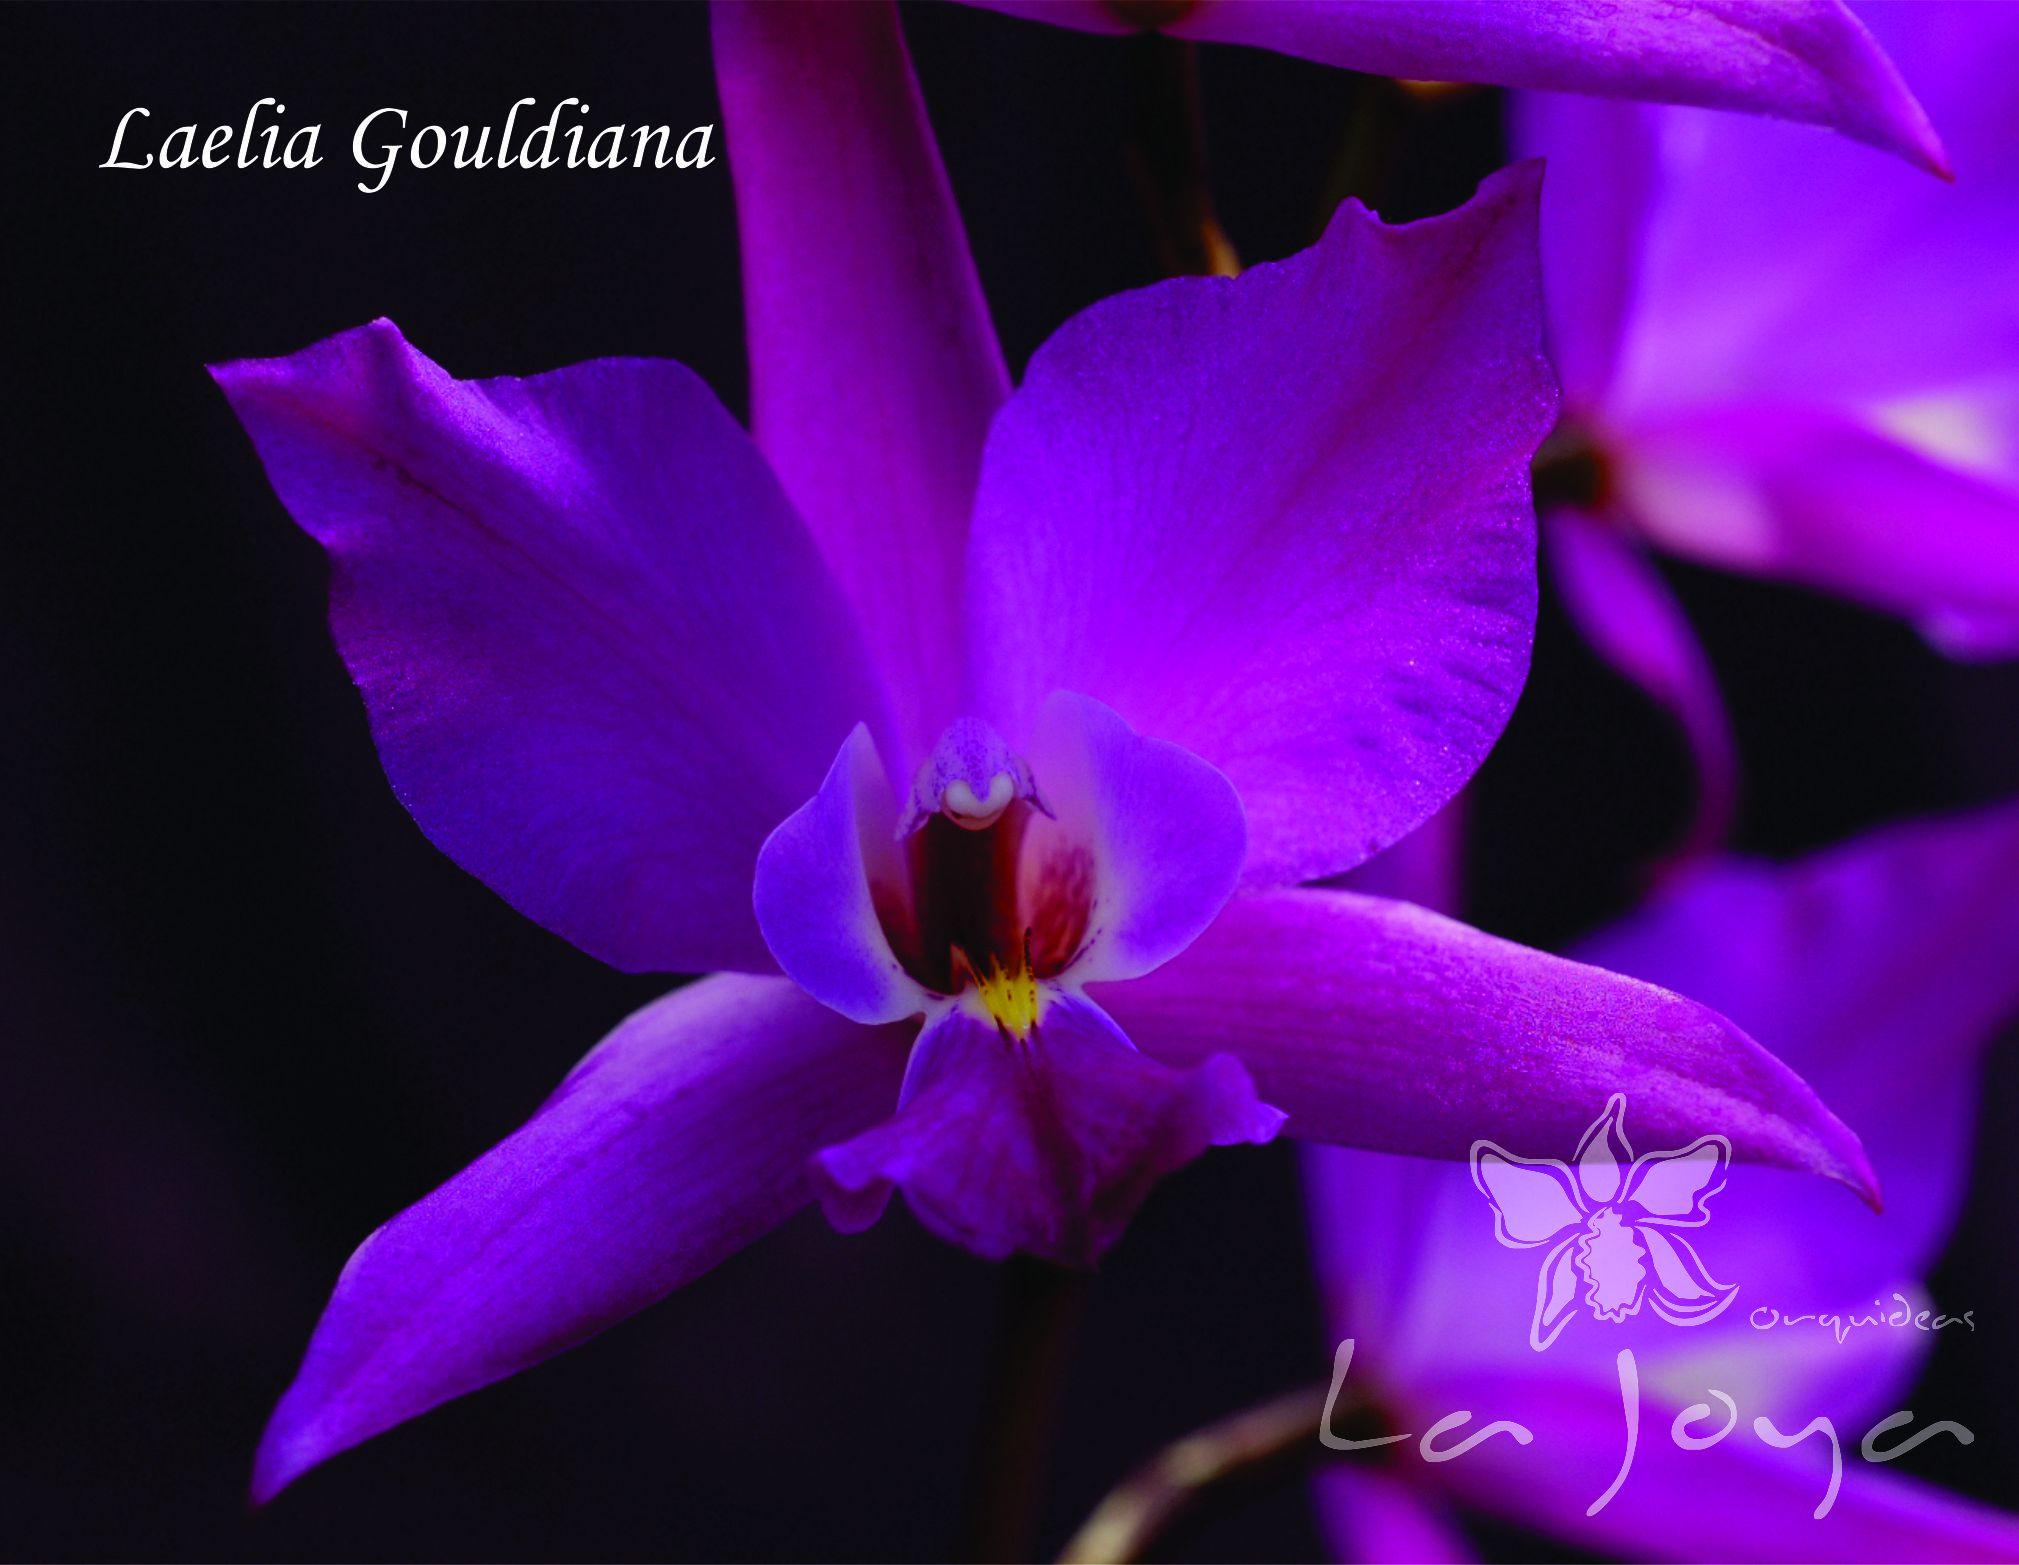 Laelia Gouldiana